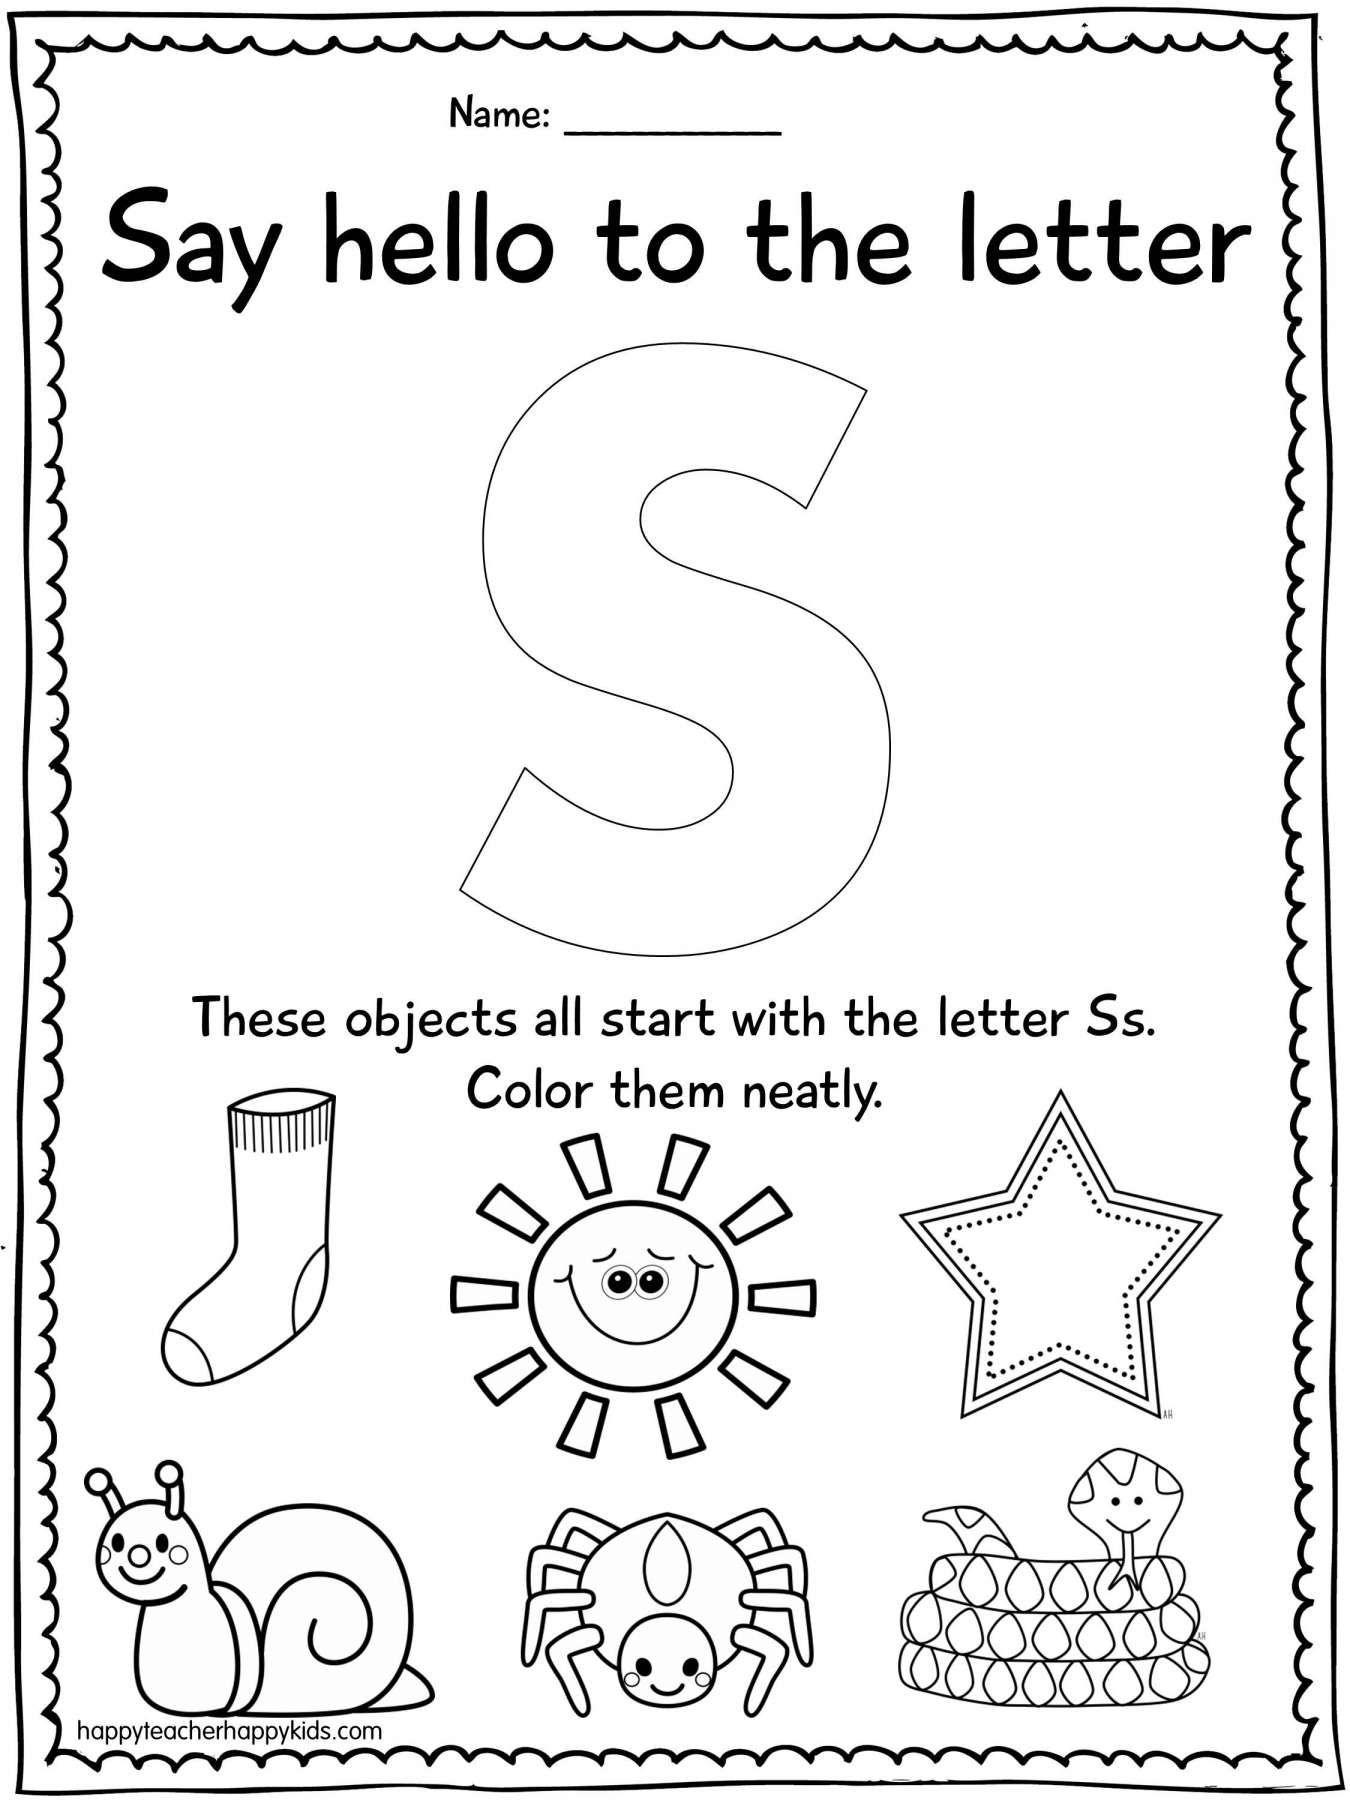 10 Shapes Maze Letter S Worksheet Preschool